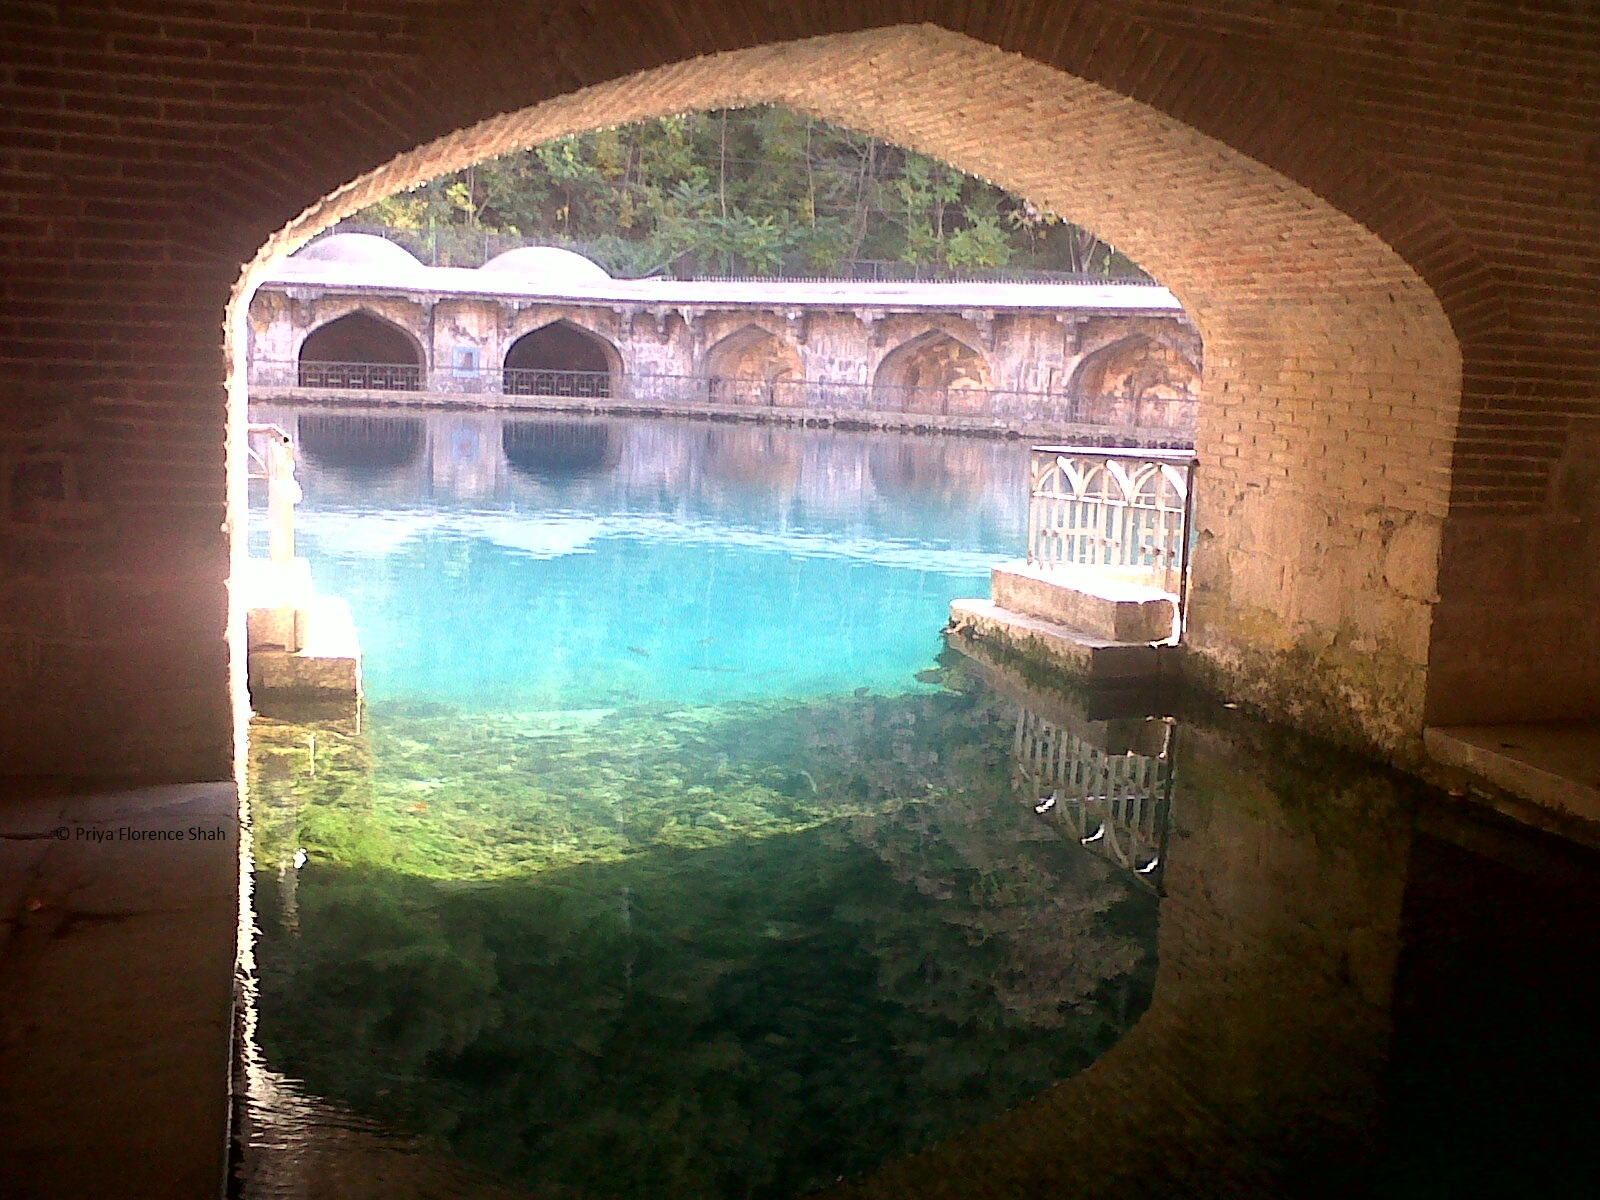 Verinag Springs, Kashmir: Origin Of The Jhelum